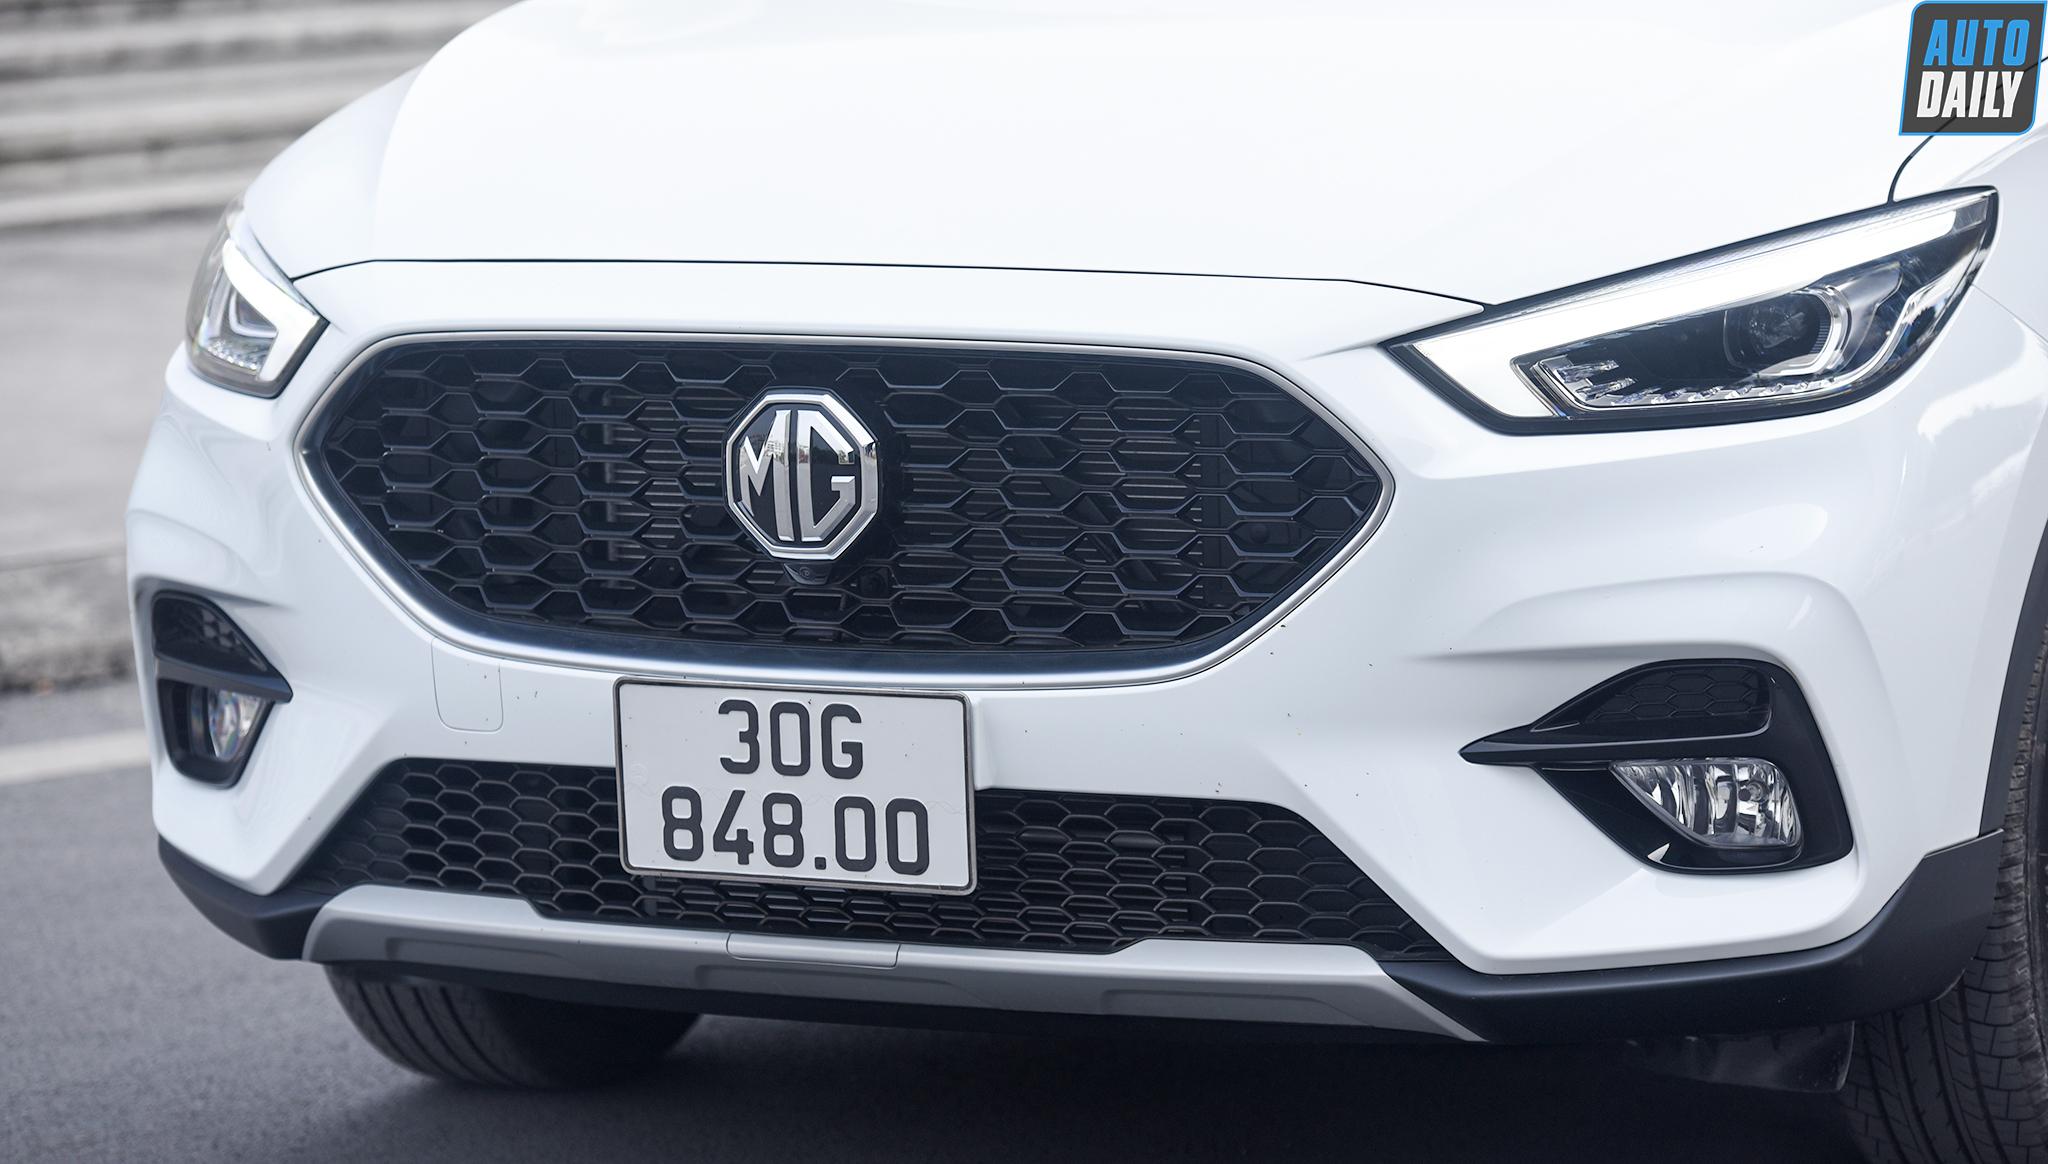 MG ZS 2021 evaluation: Reasonable choice of price range of VND 600 million 8.jpg